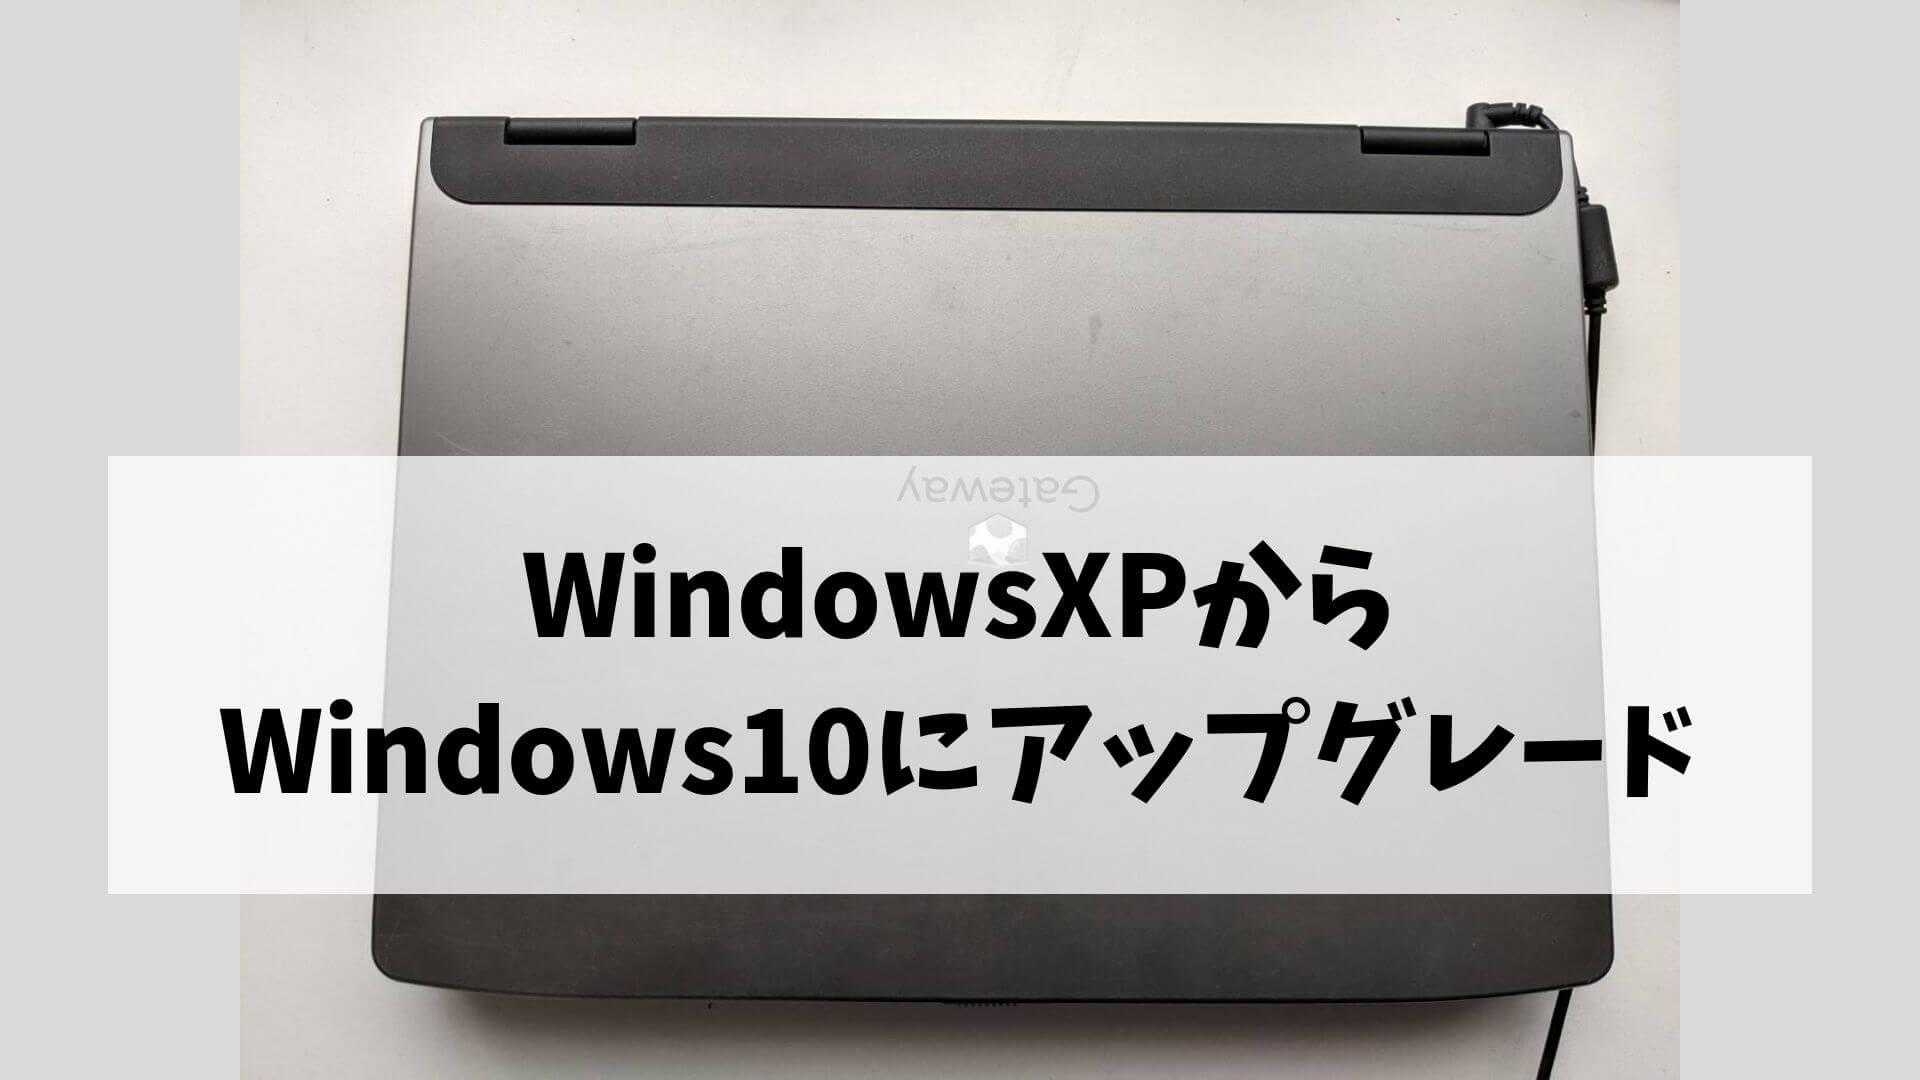 WindowsXPから Windows10にアップグレード